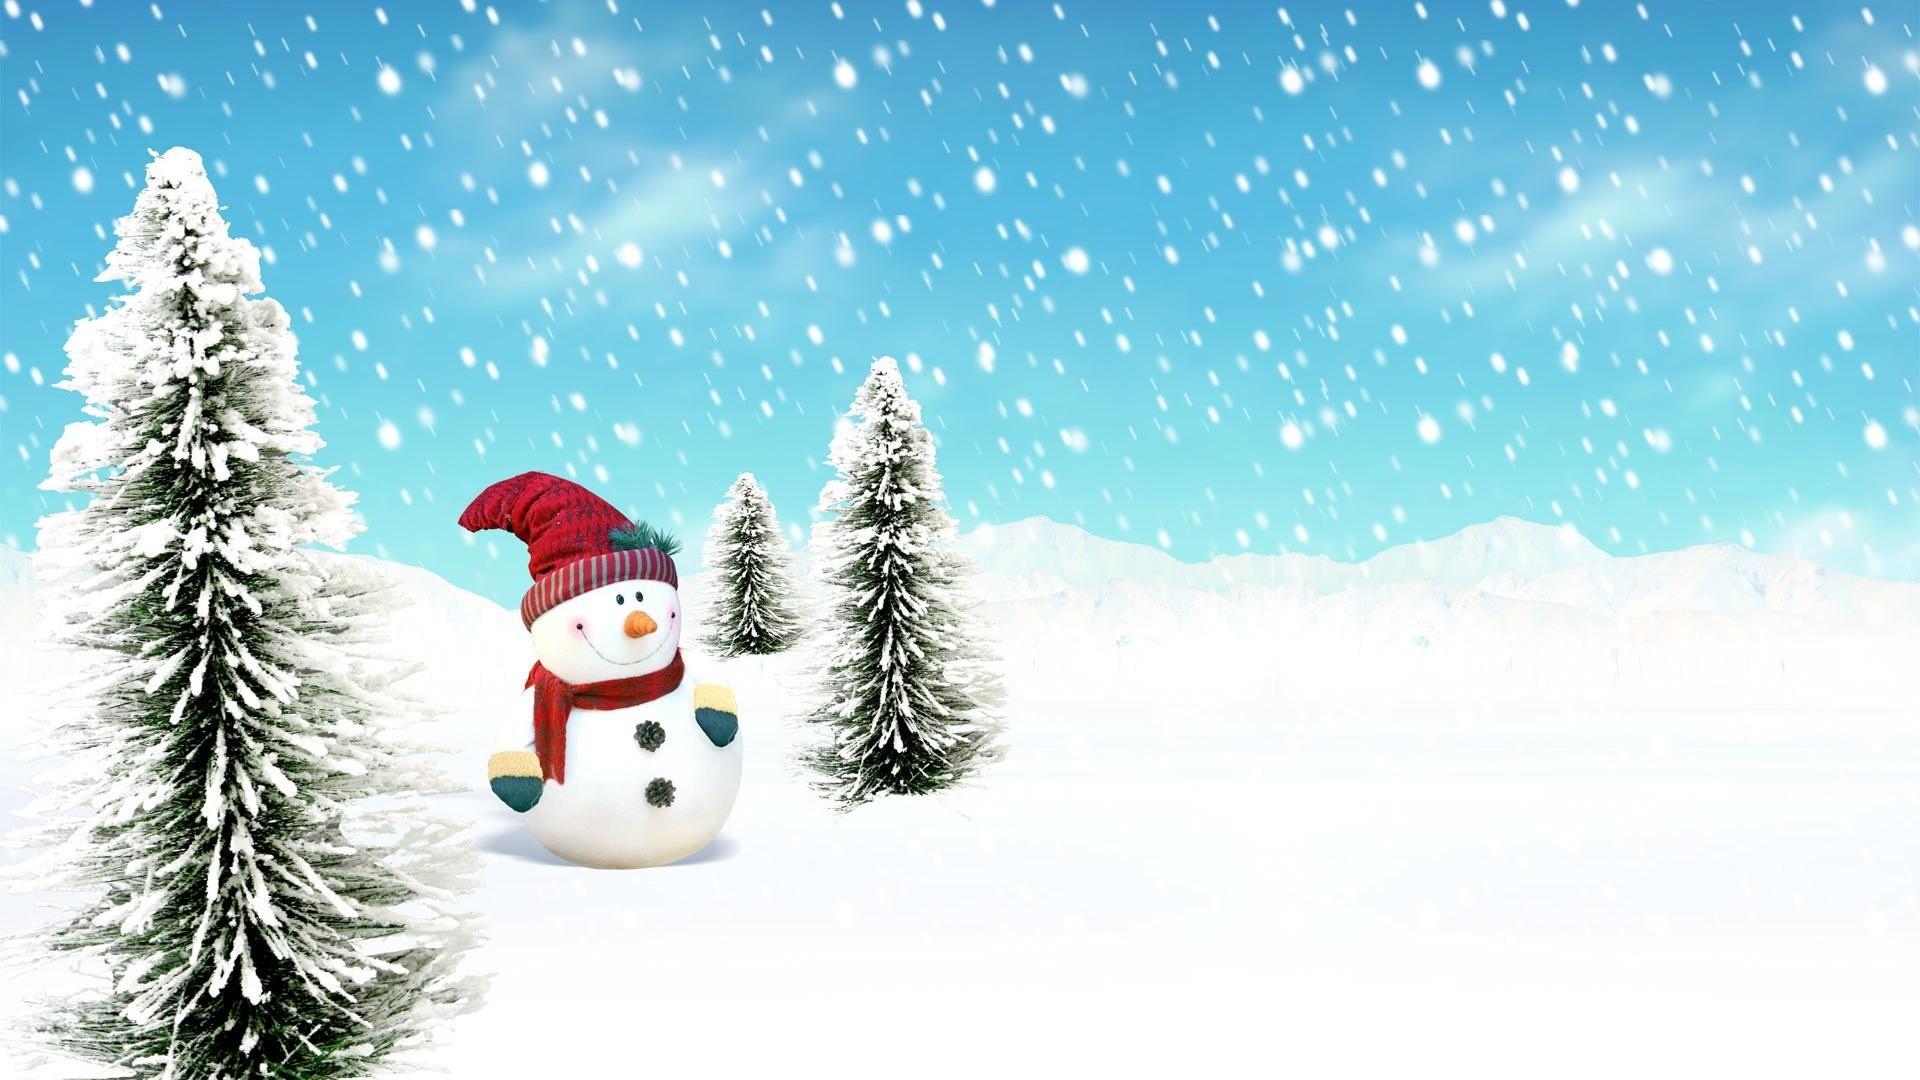 68 Snowman Desktop Wallpapers on WallpaperPlay 1920x1080